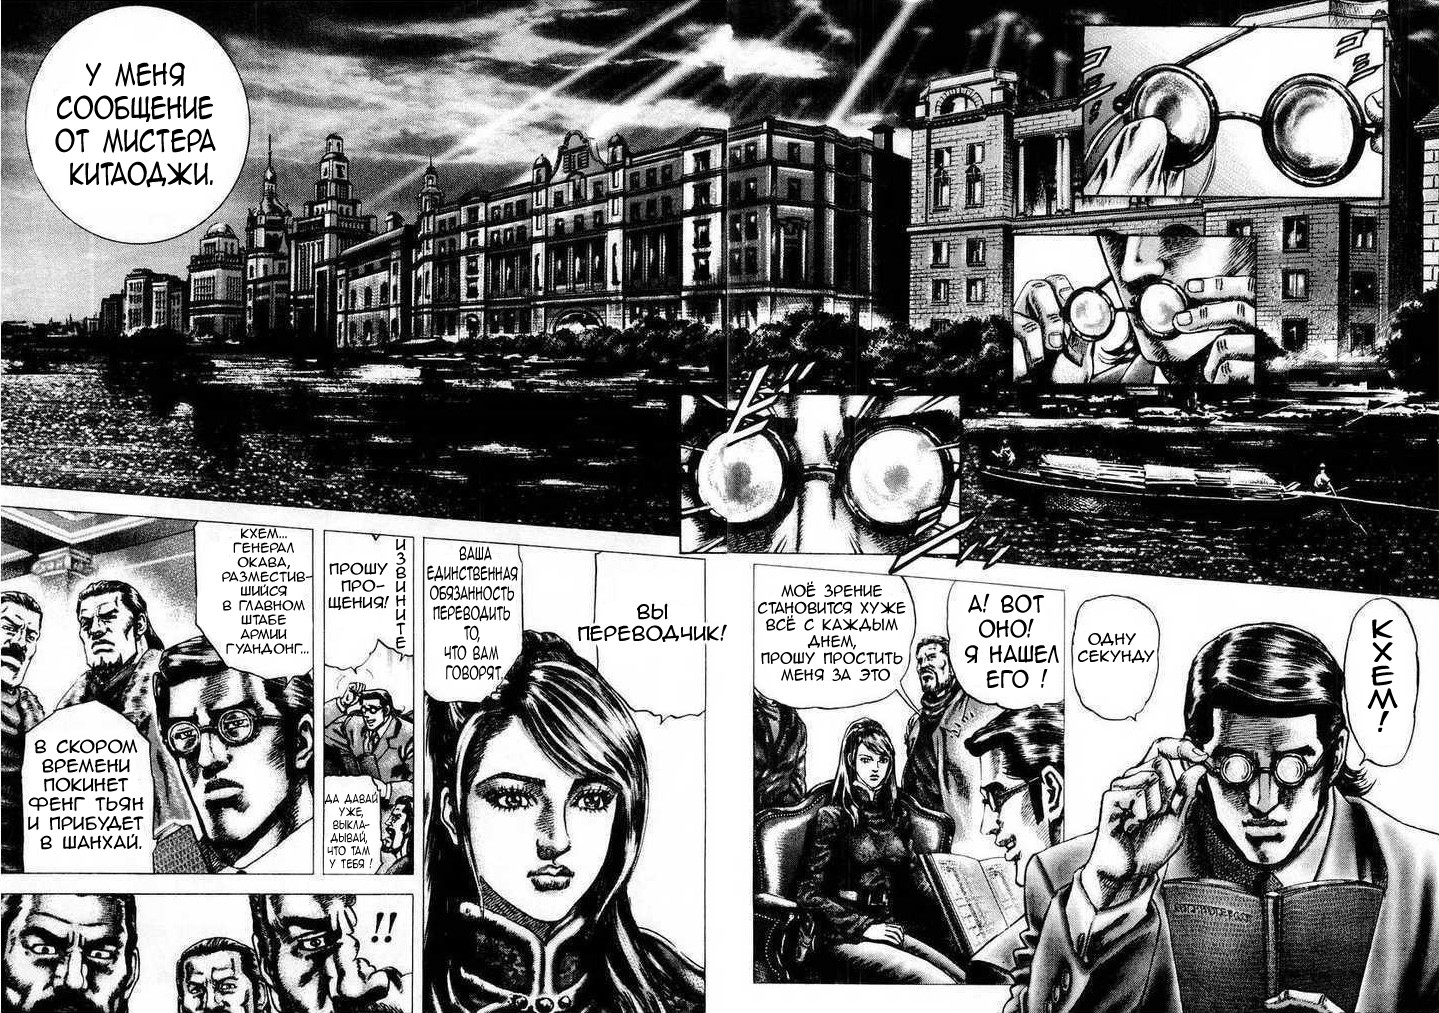 https://r1.ninemanga.com/comics/pic2/6/29190/307411/1471065390667.jpg Page 5